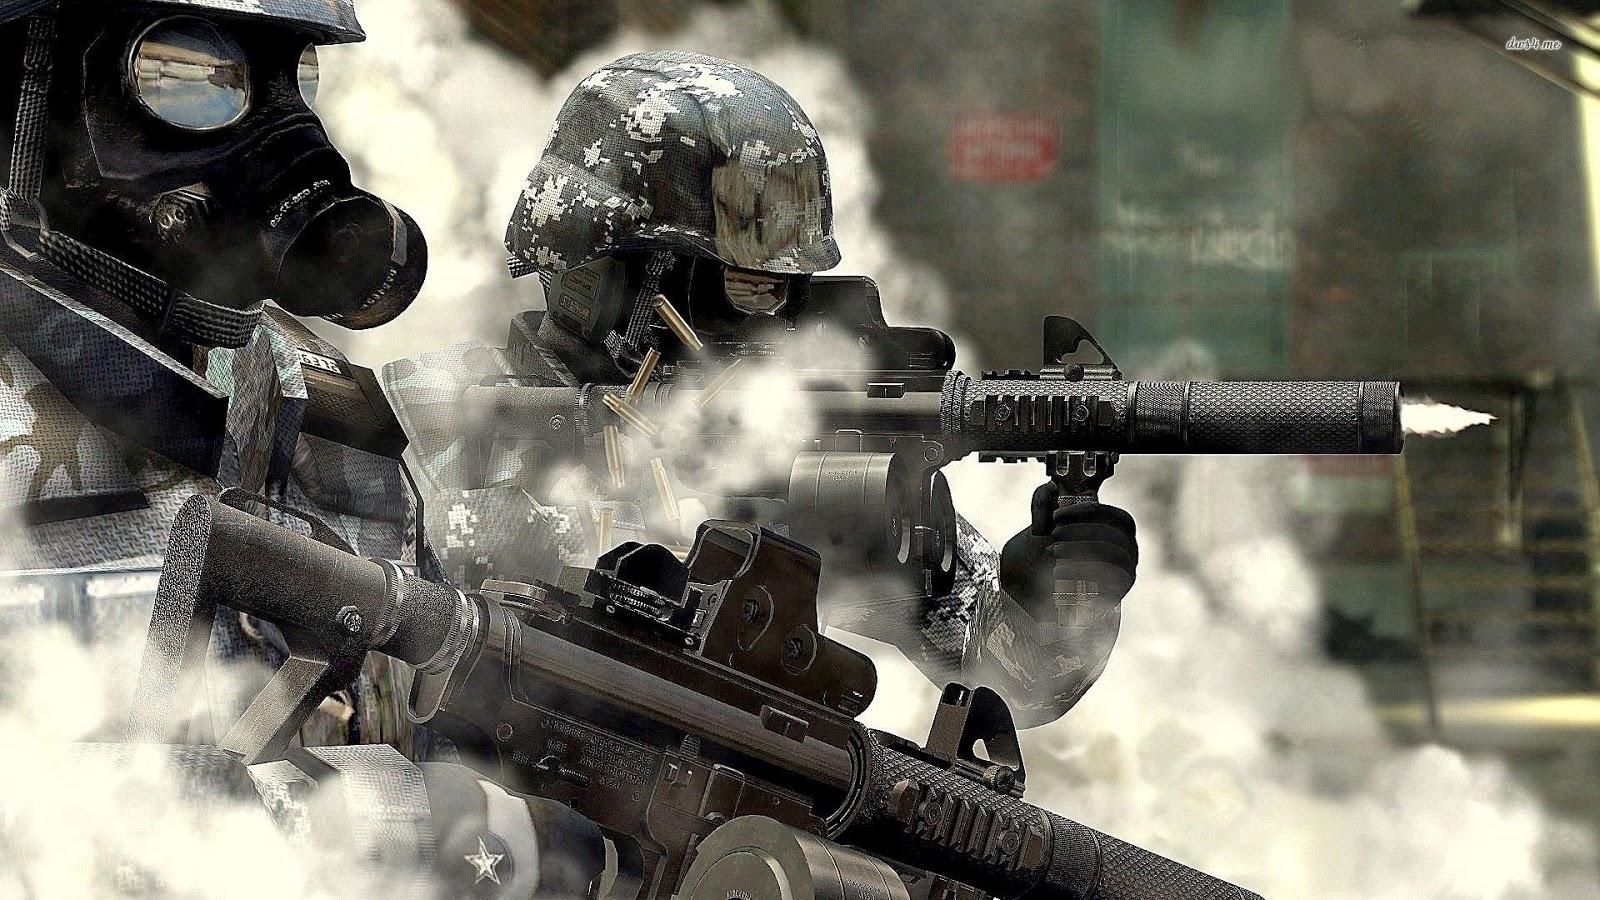 75 Call Of Duty Modern Warfare 3 Wallpapers Wallpaperceiling